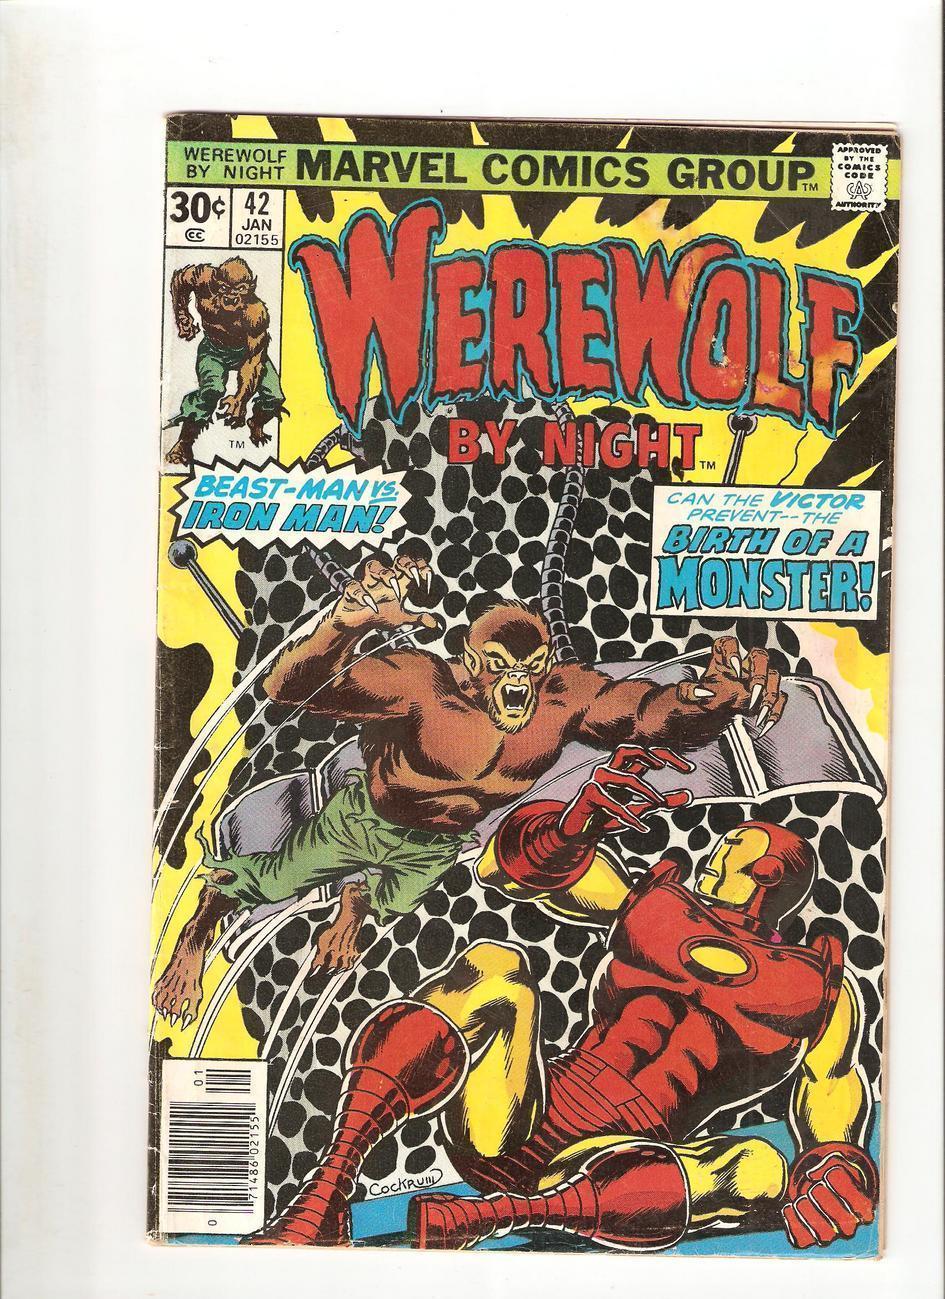 Werewolfbynight 42